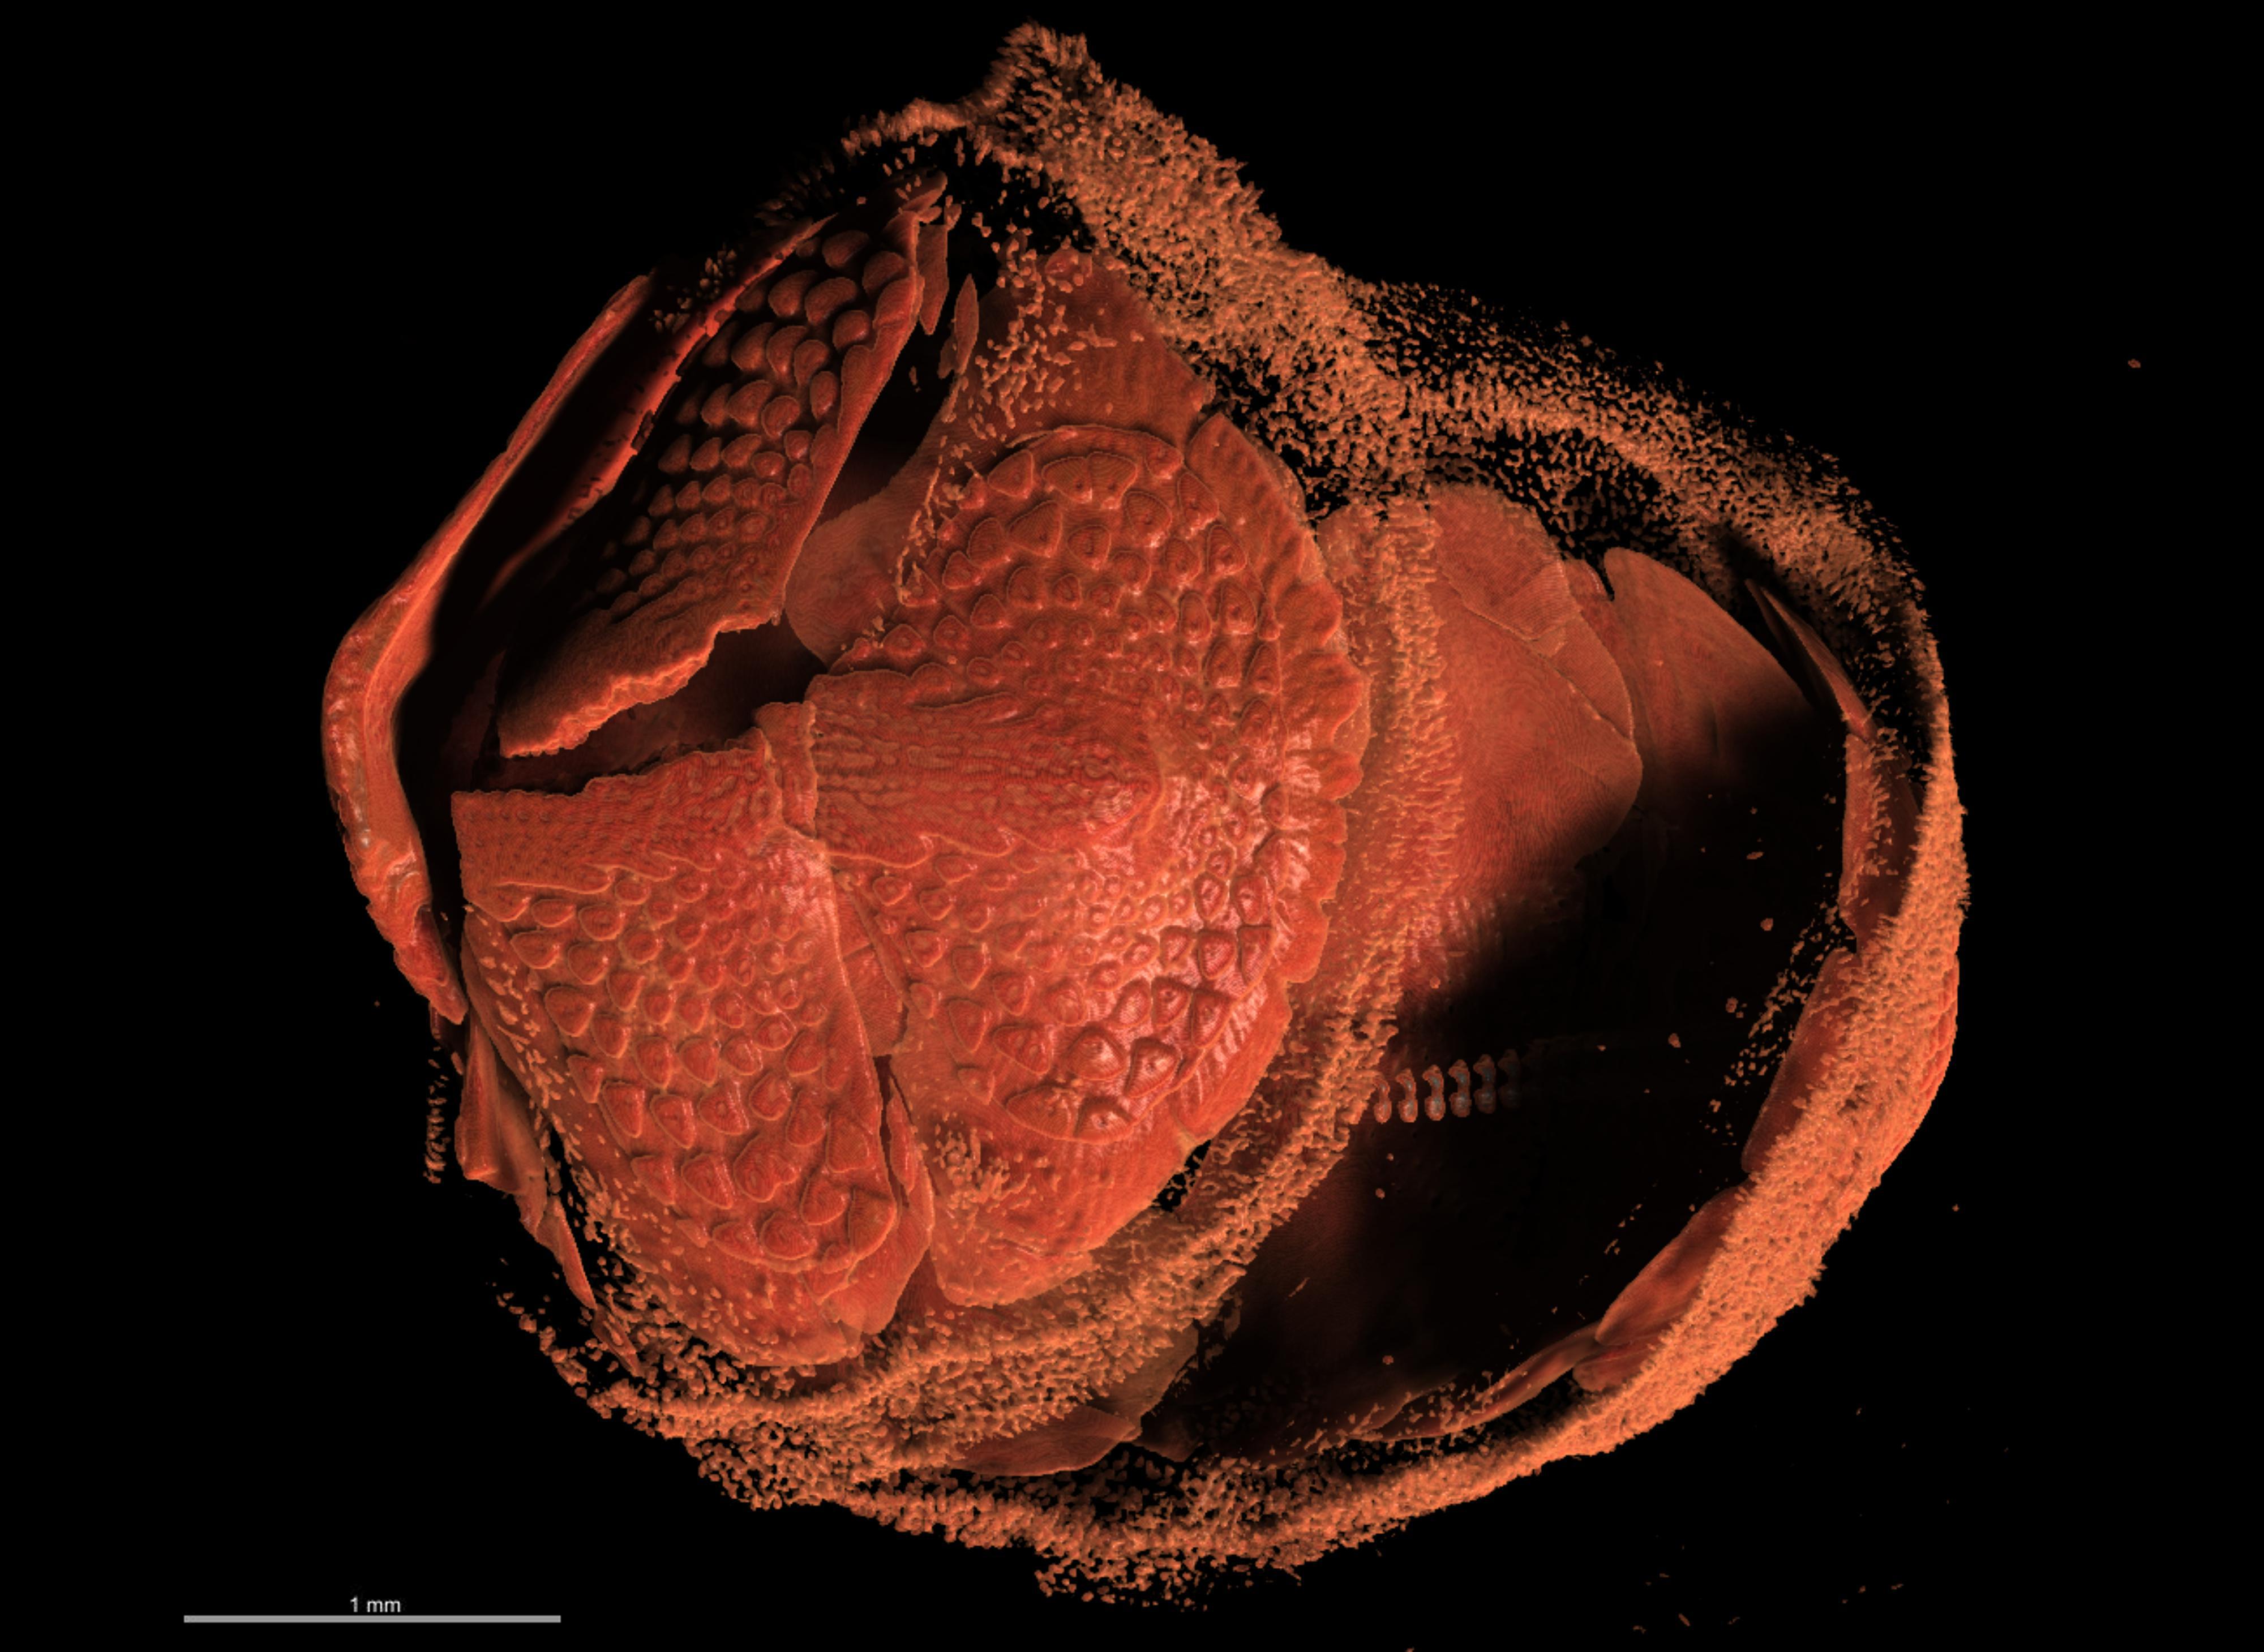 BE-RBINS-INV LECTOYPE MT.3804 Acanthochitona curvisetosus MICROCT XRE POSTERIOR.jpg